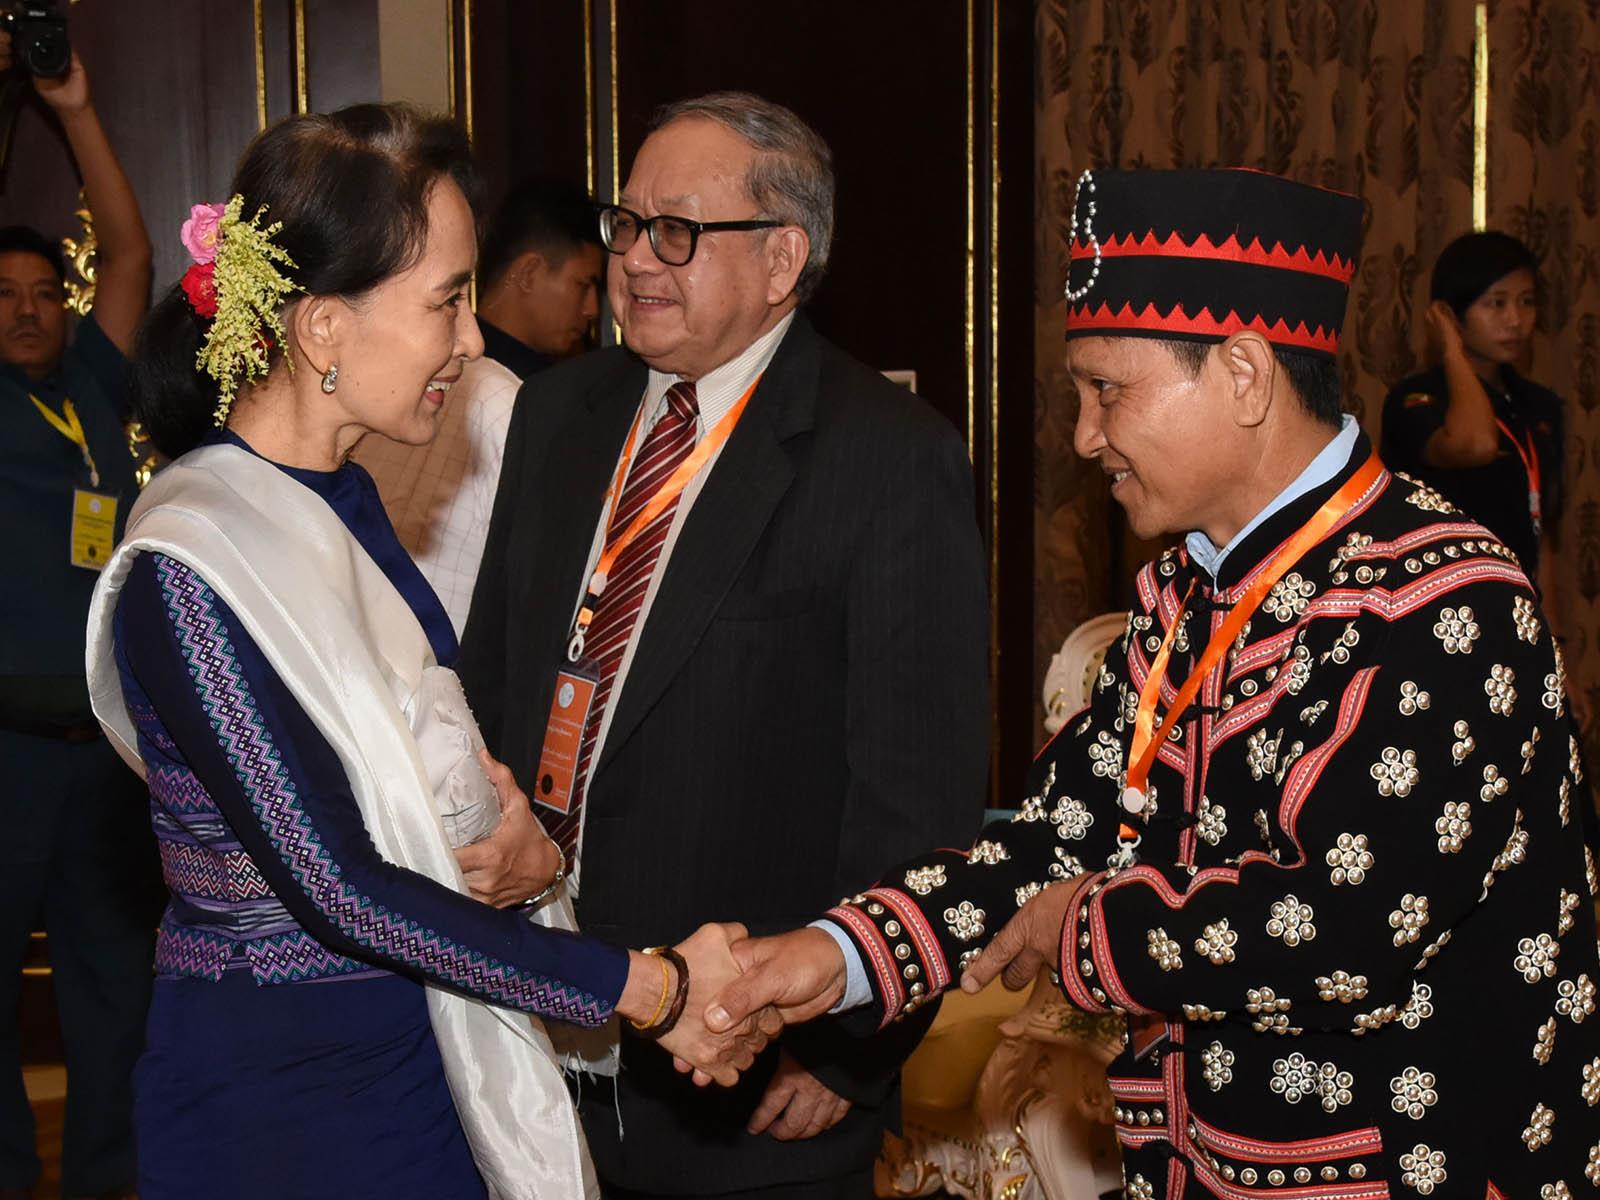 State Counsellor Daw Aung San Suu Kyi greets Chairman of Lahu Democratic Union Kyar Khun Sar in Nay Pyi Taw.